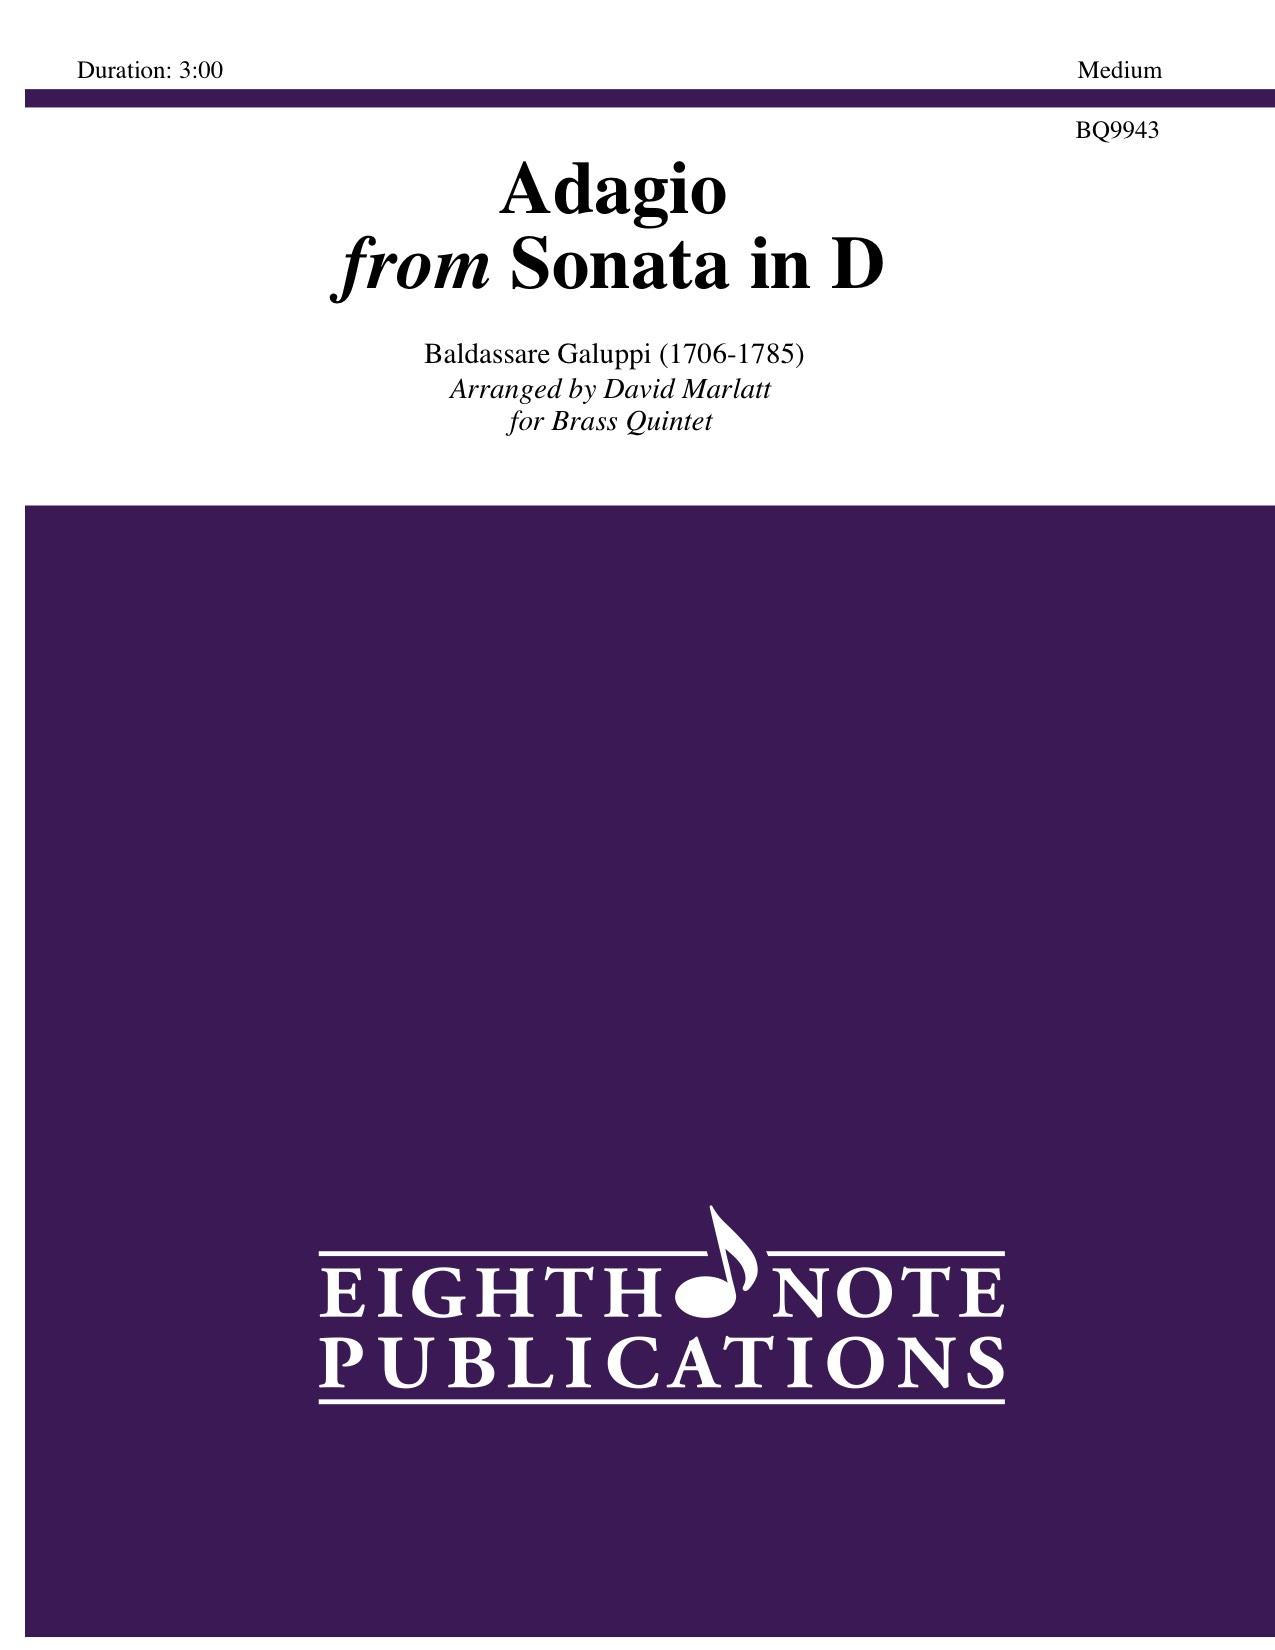 Adagio from Sonata in D Major - Baldassare Galuppi